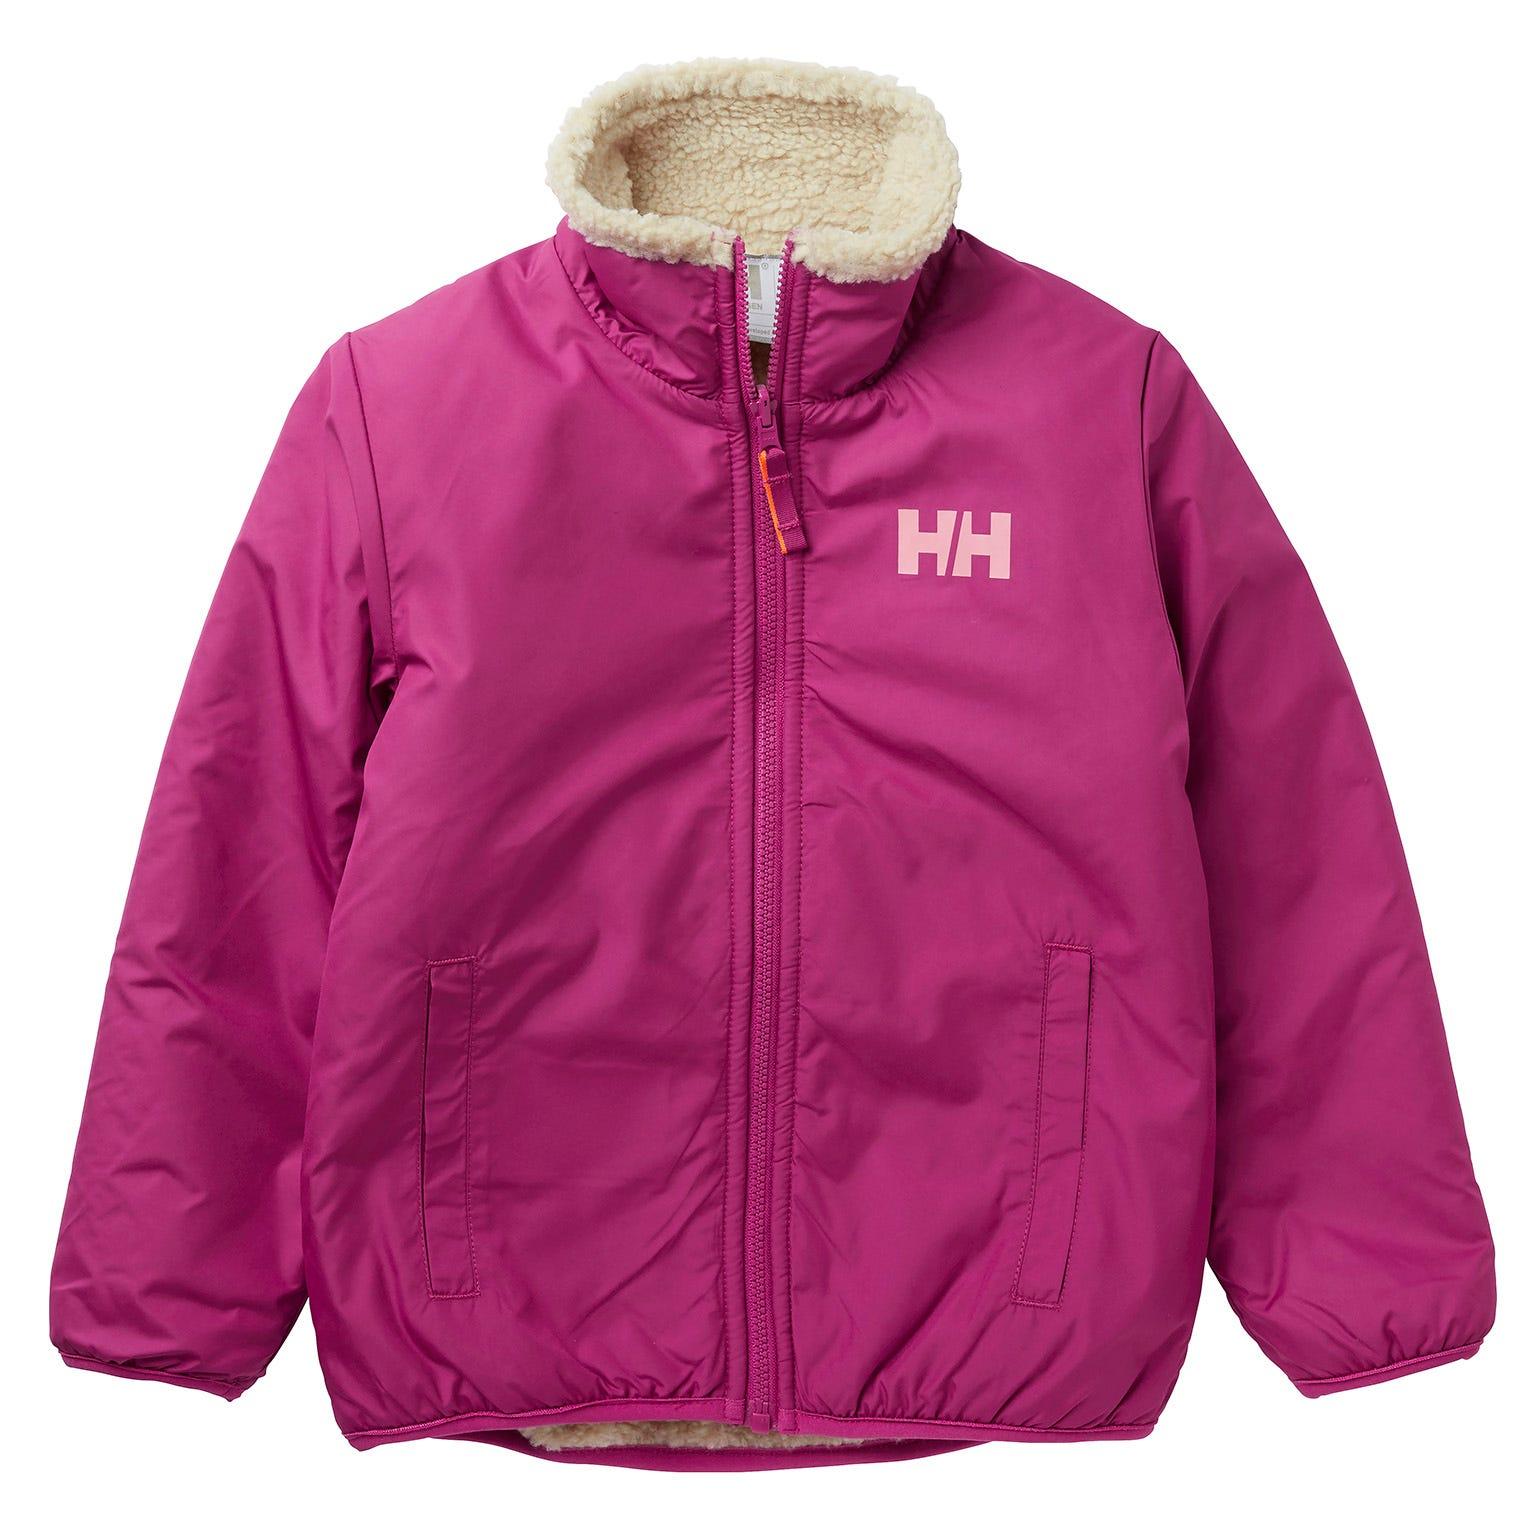 Helly Hansen Kids Reversible Pile Jacket Parka Yellow 122/7